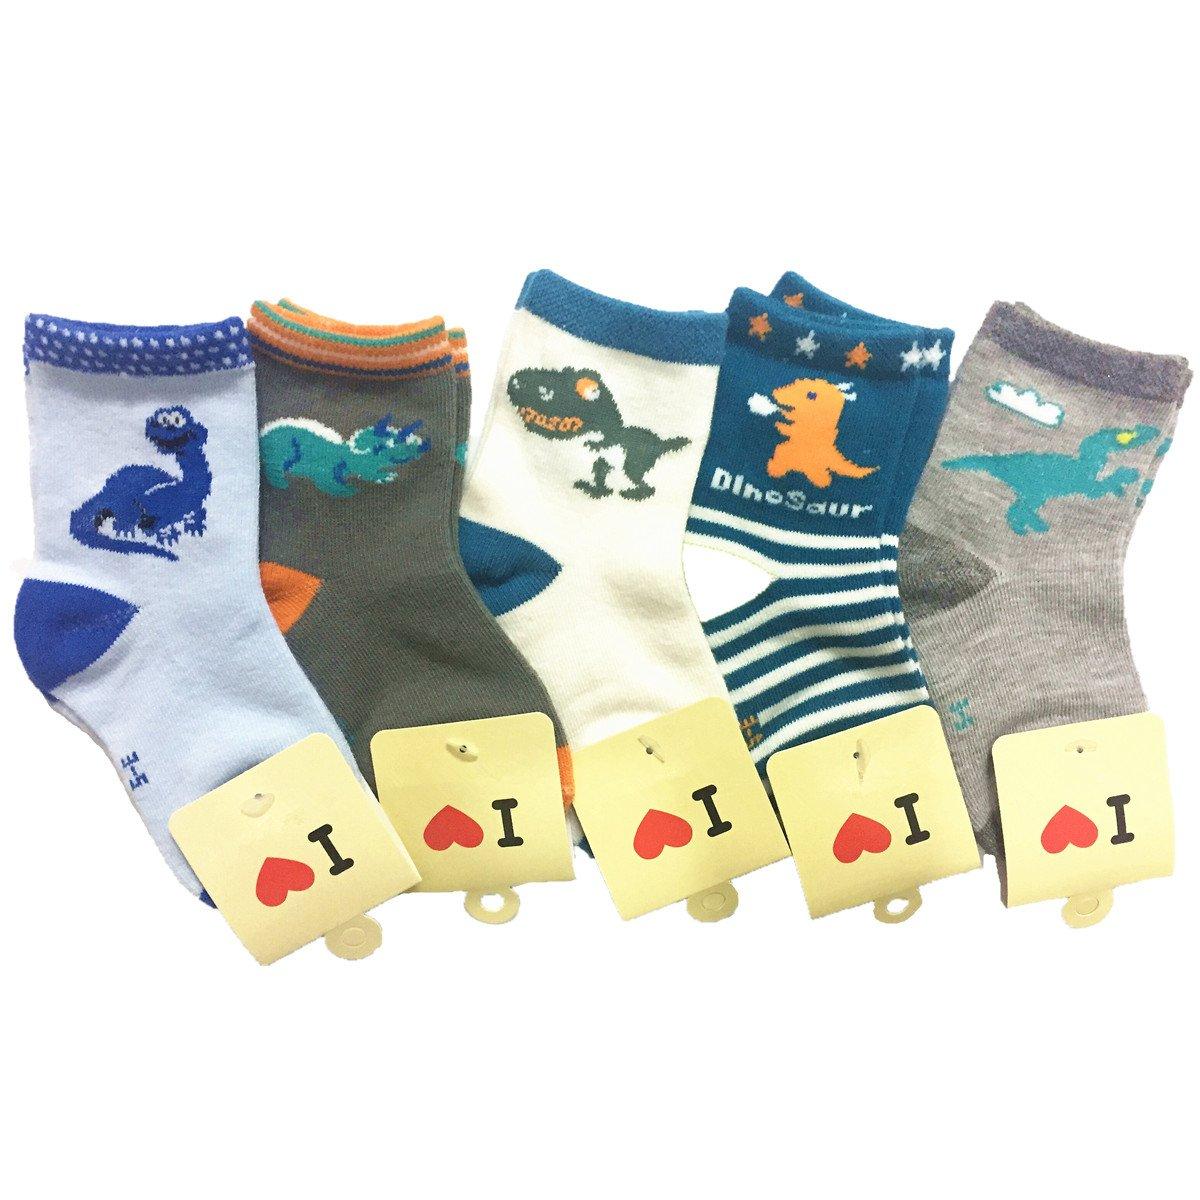 Little Boys Socks Cotton Dinosaur Comfort Crew Socks 5 Pair Pack Cczmfeas